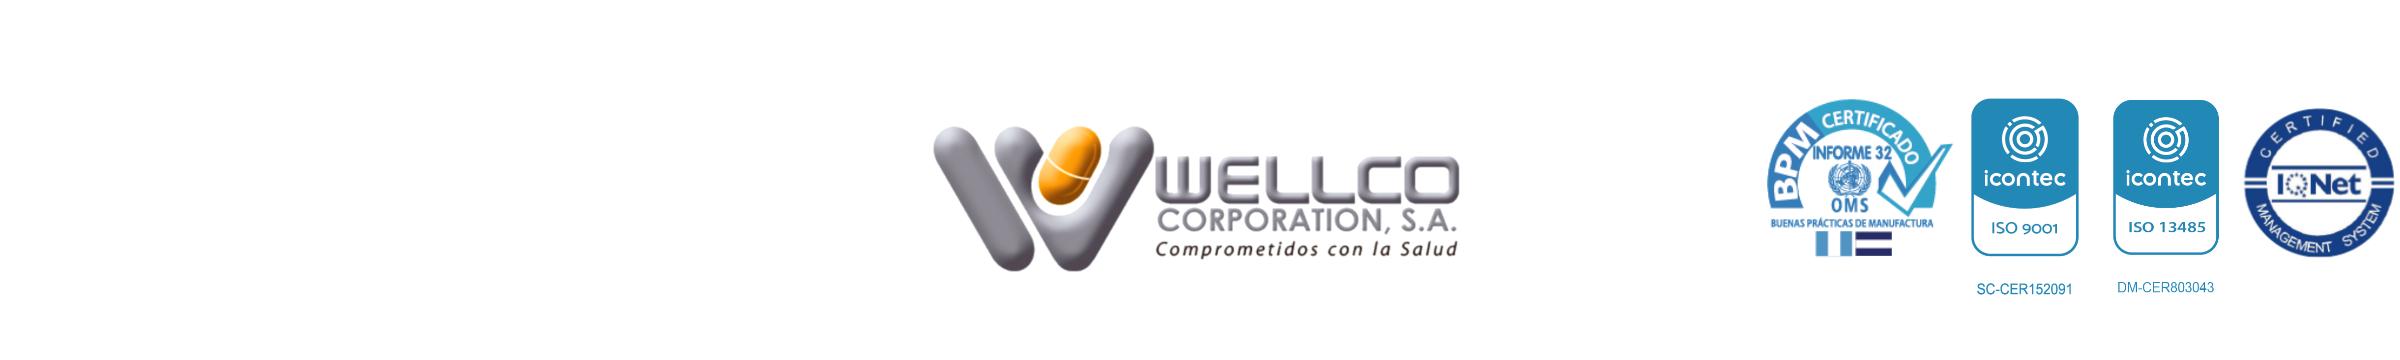 Wellcopharma